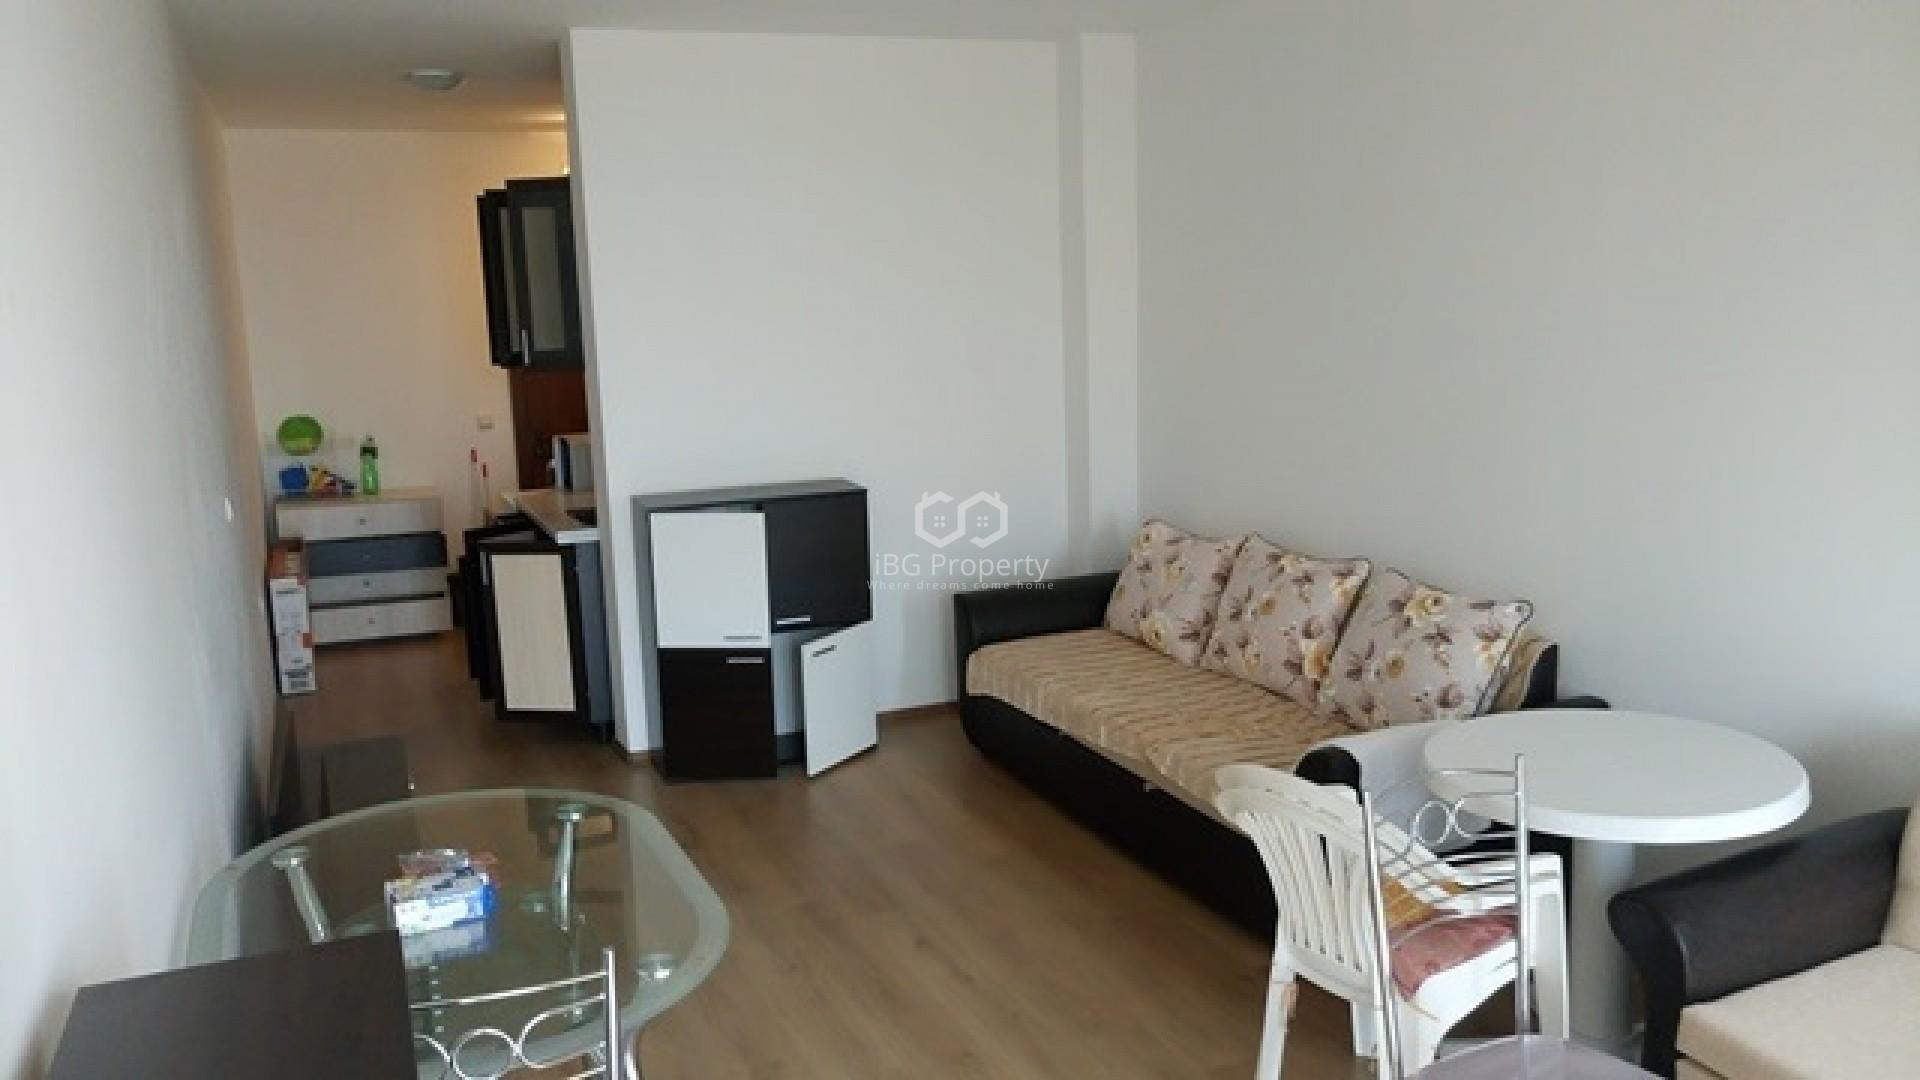 Eдностаен апартамент Слънчев Бряг 49 m2